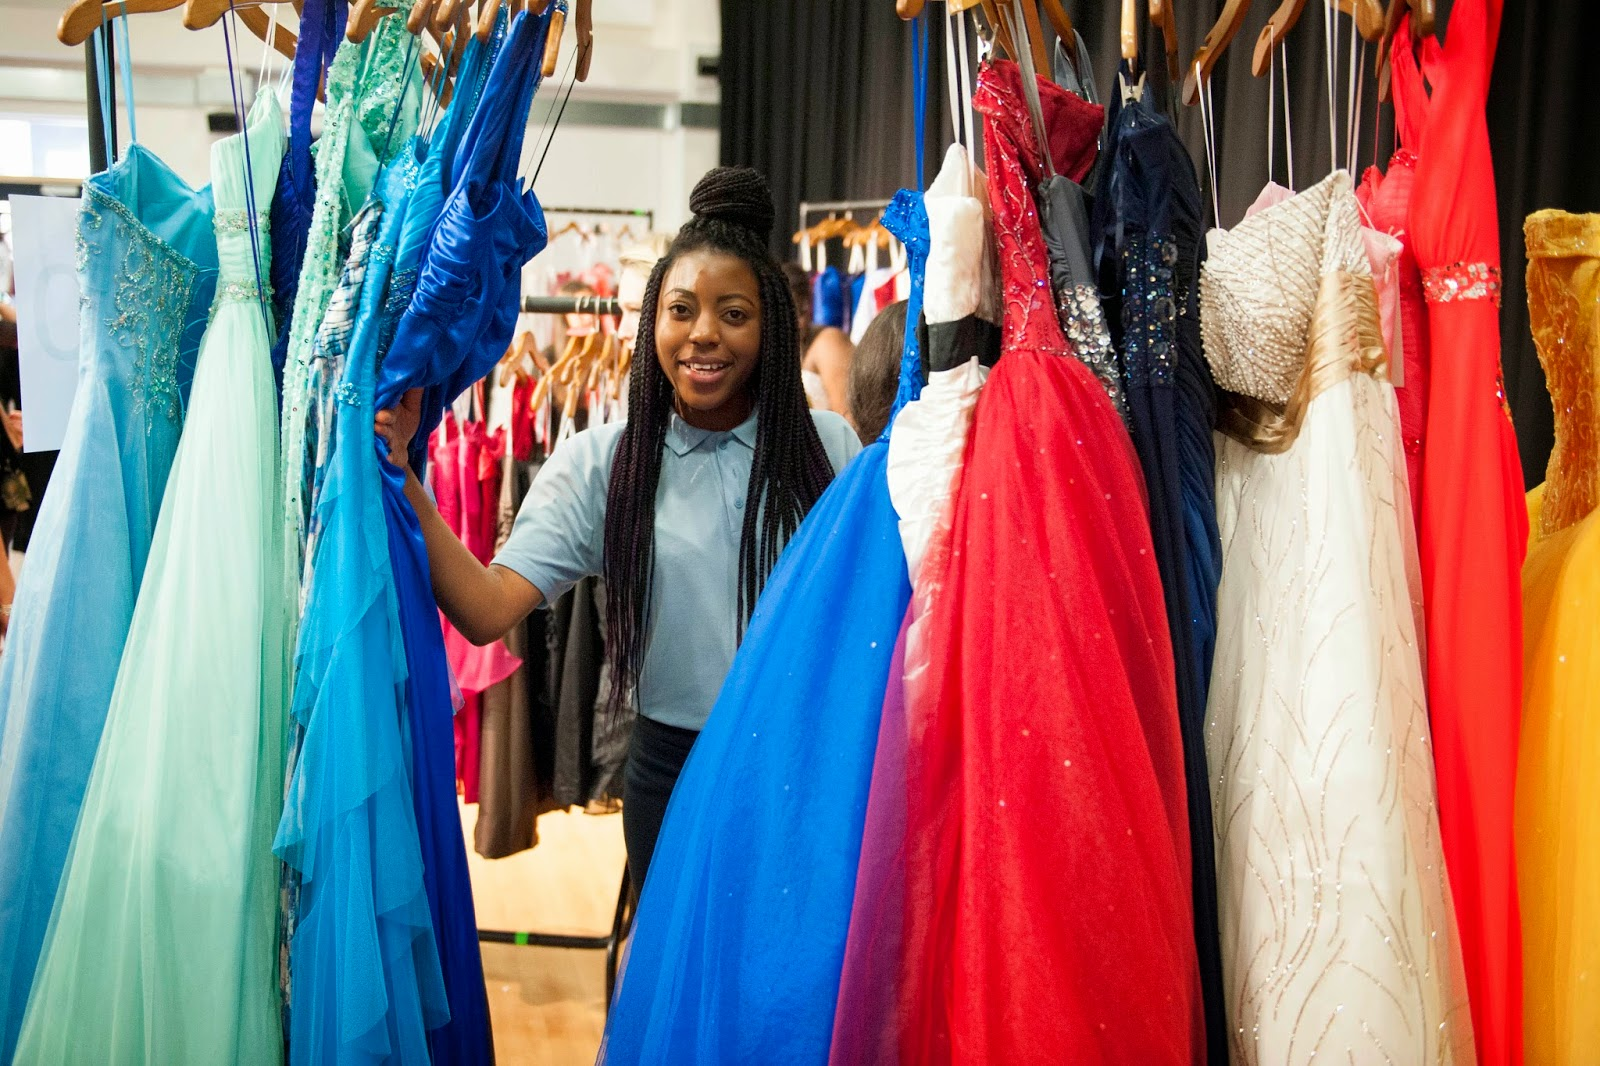 Frumpy To Funky Davids Bridal Donates 150 Prom Dresses To